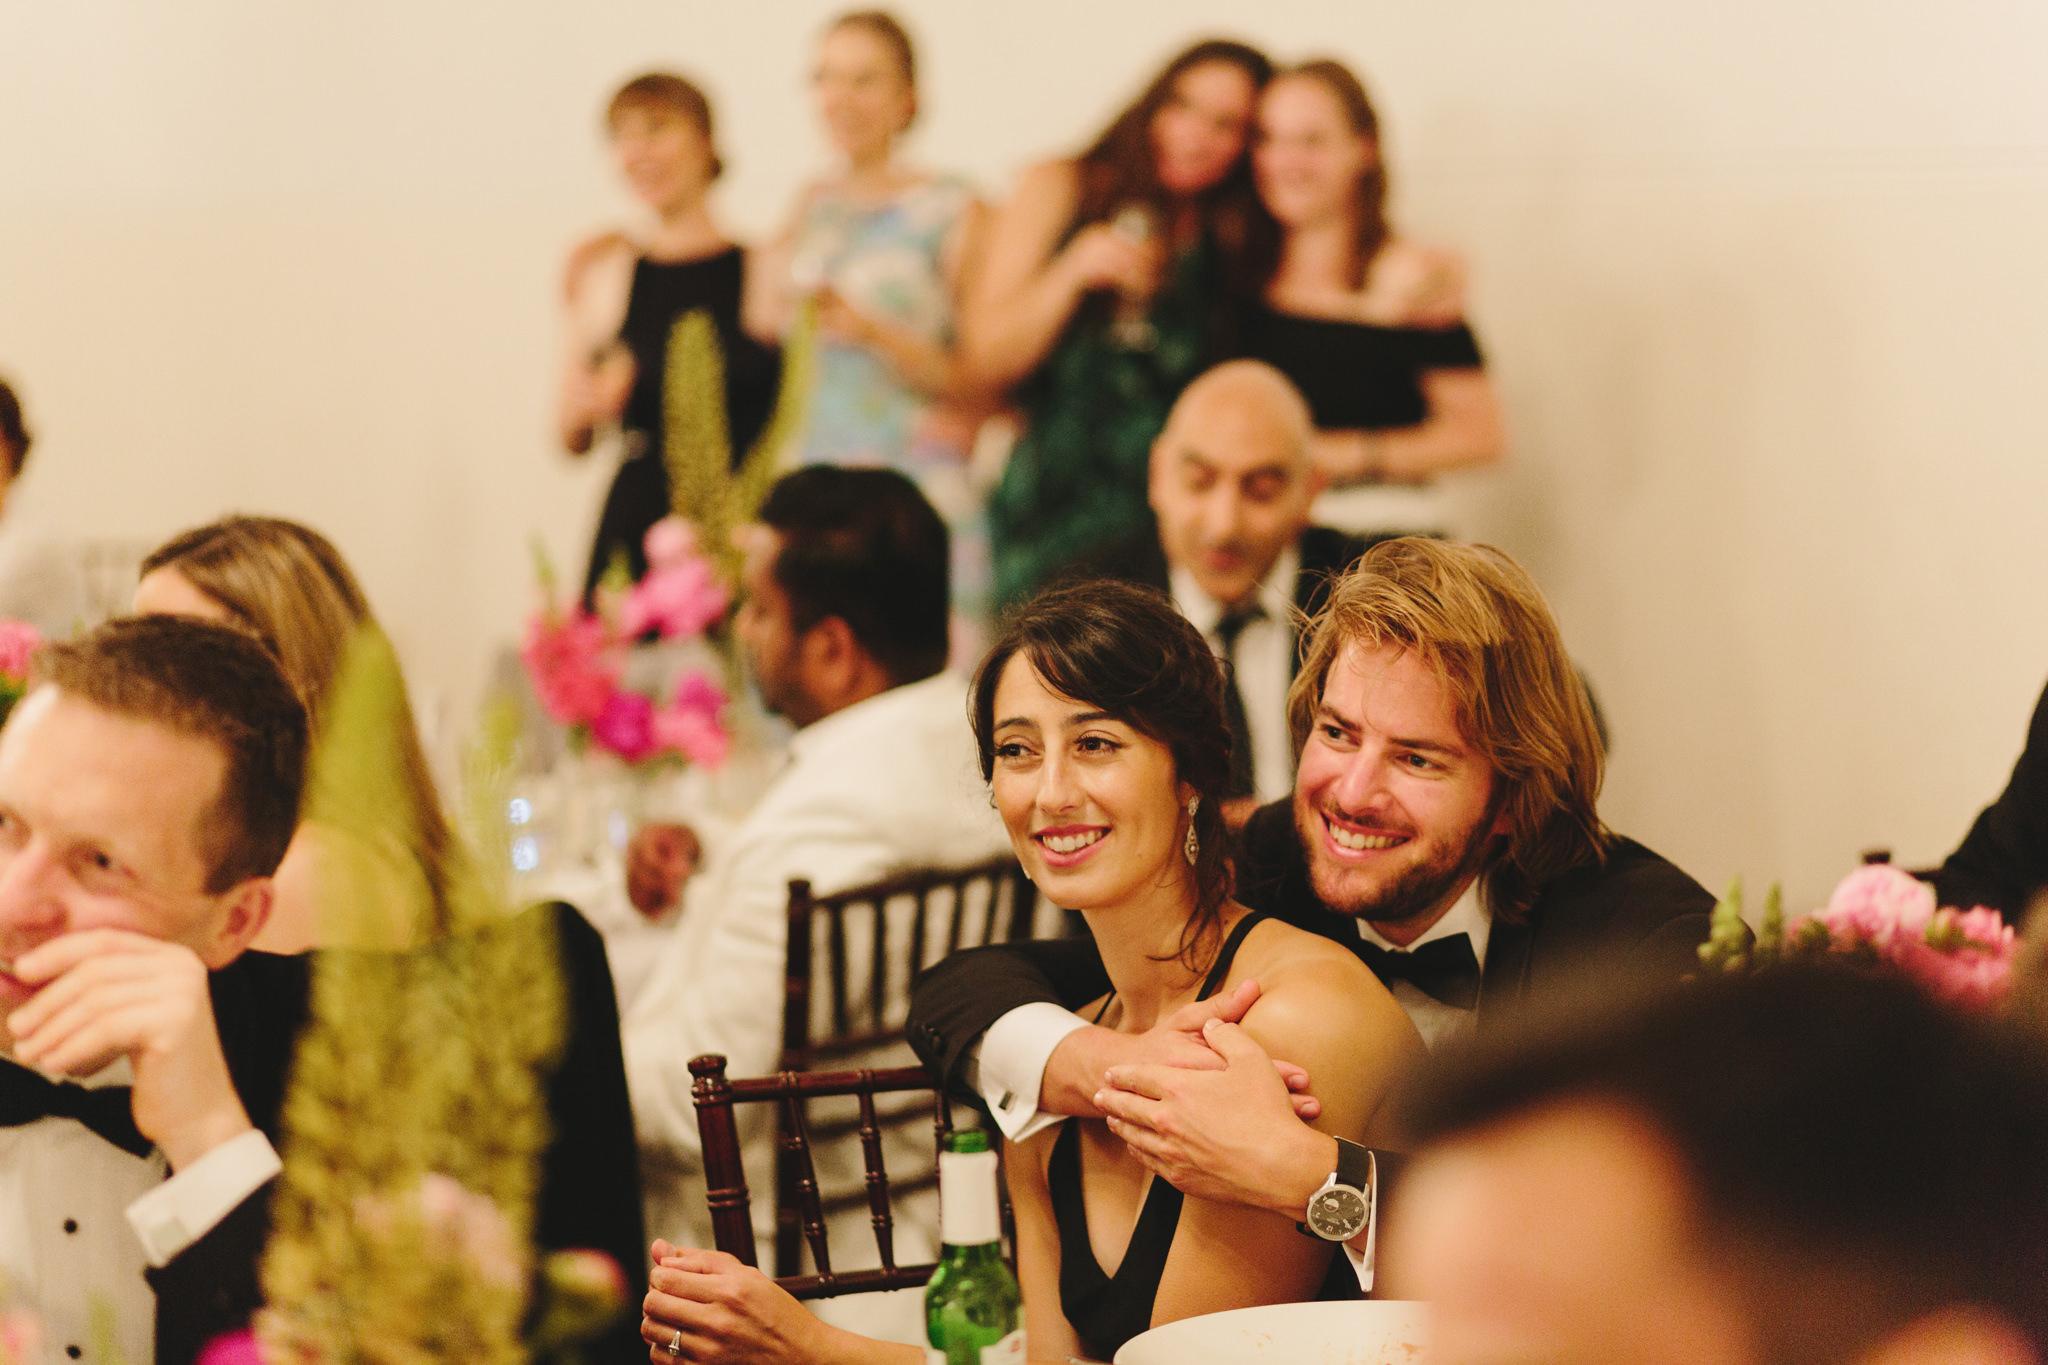 Abbotsford_Convent_Wedding_Peter_Anna134.JPG